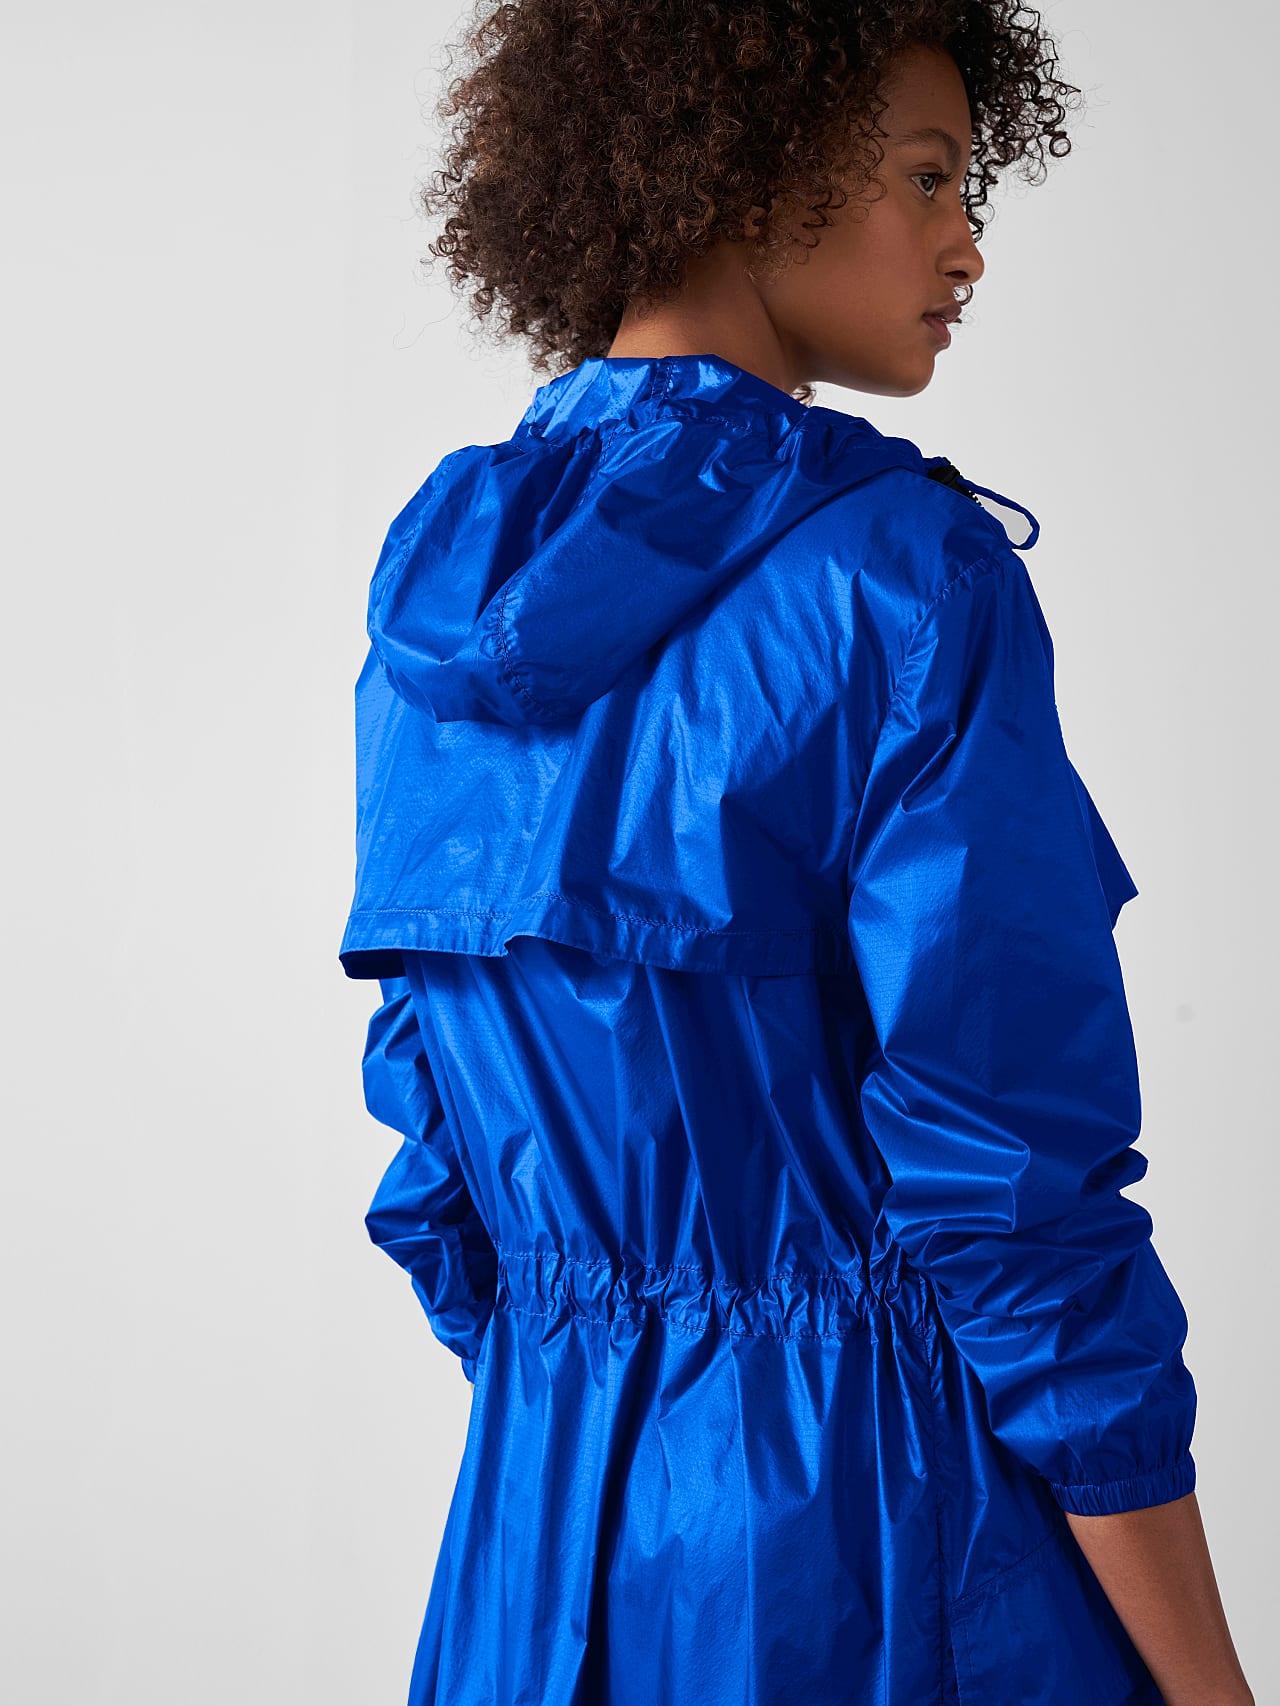 OLONO V2.Y5.01 Packable Windbreaker Coat blue Right Alpha Tauri